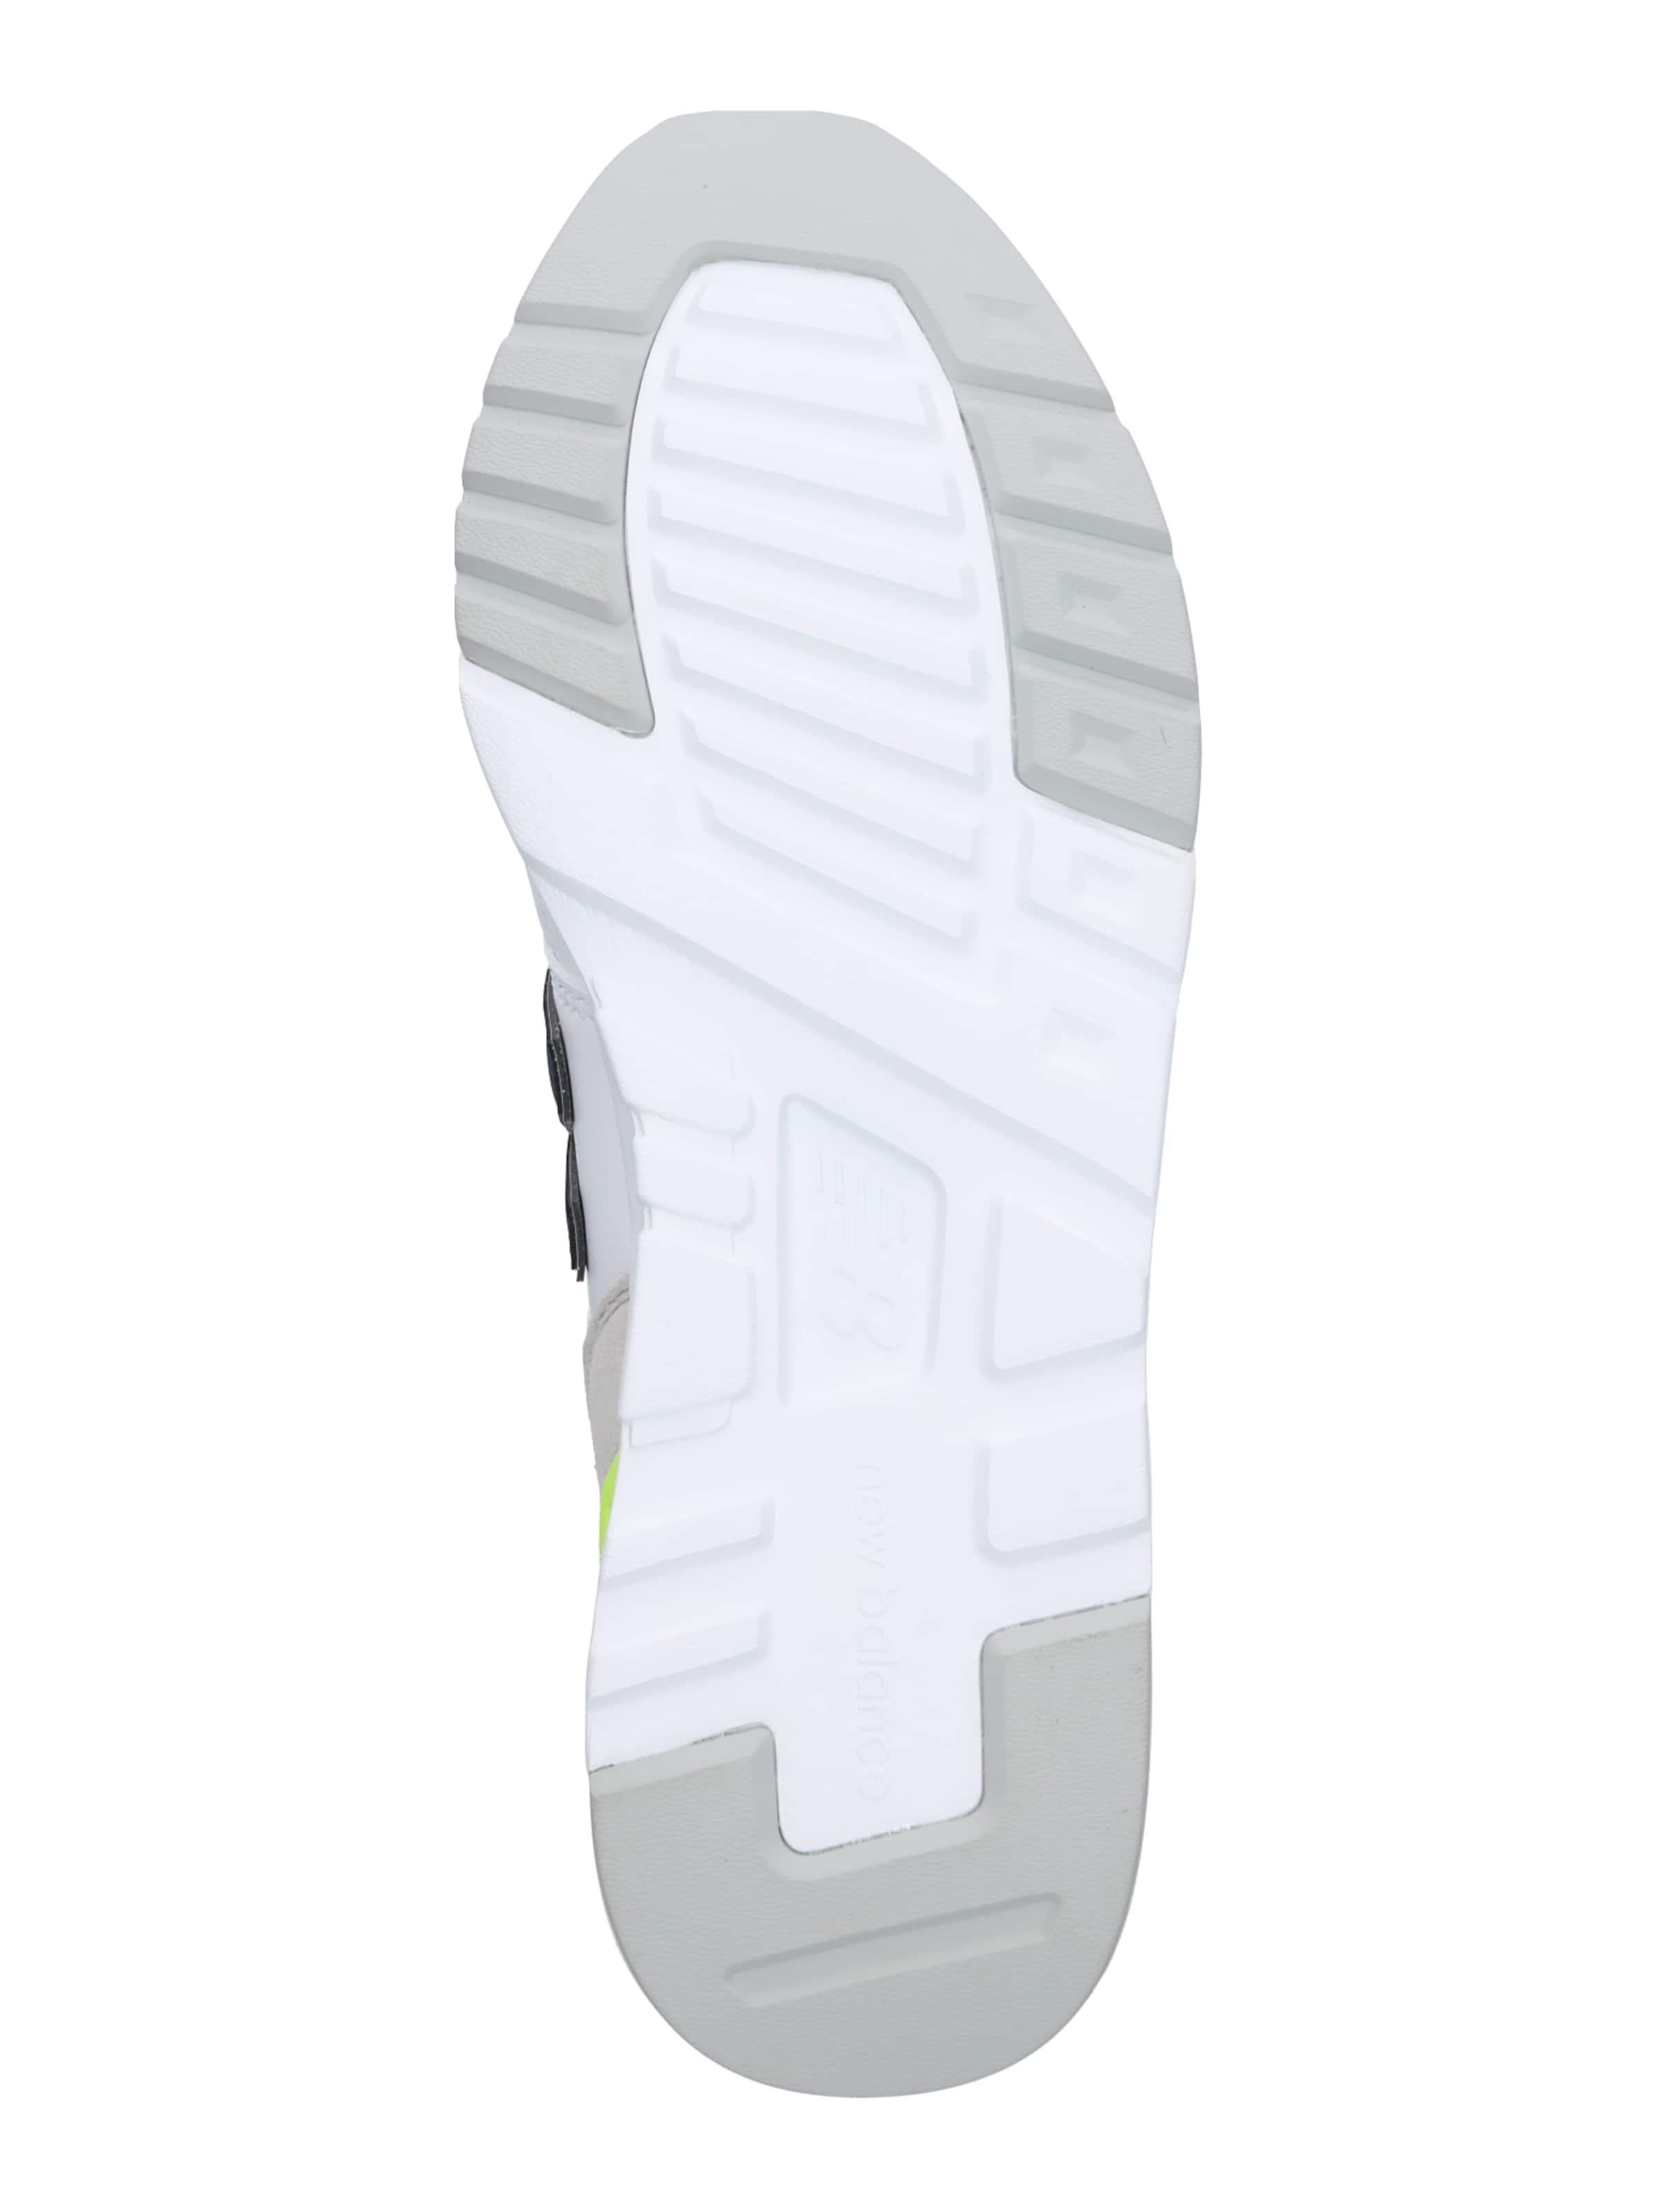 Sneaker 'cm997 New Balance GelbWeiß H' In 76yIvYbfg